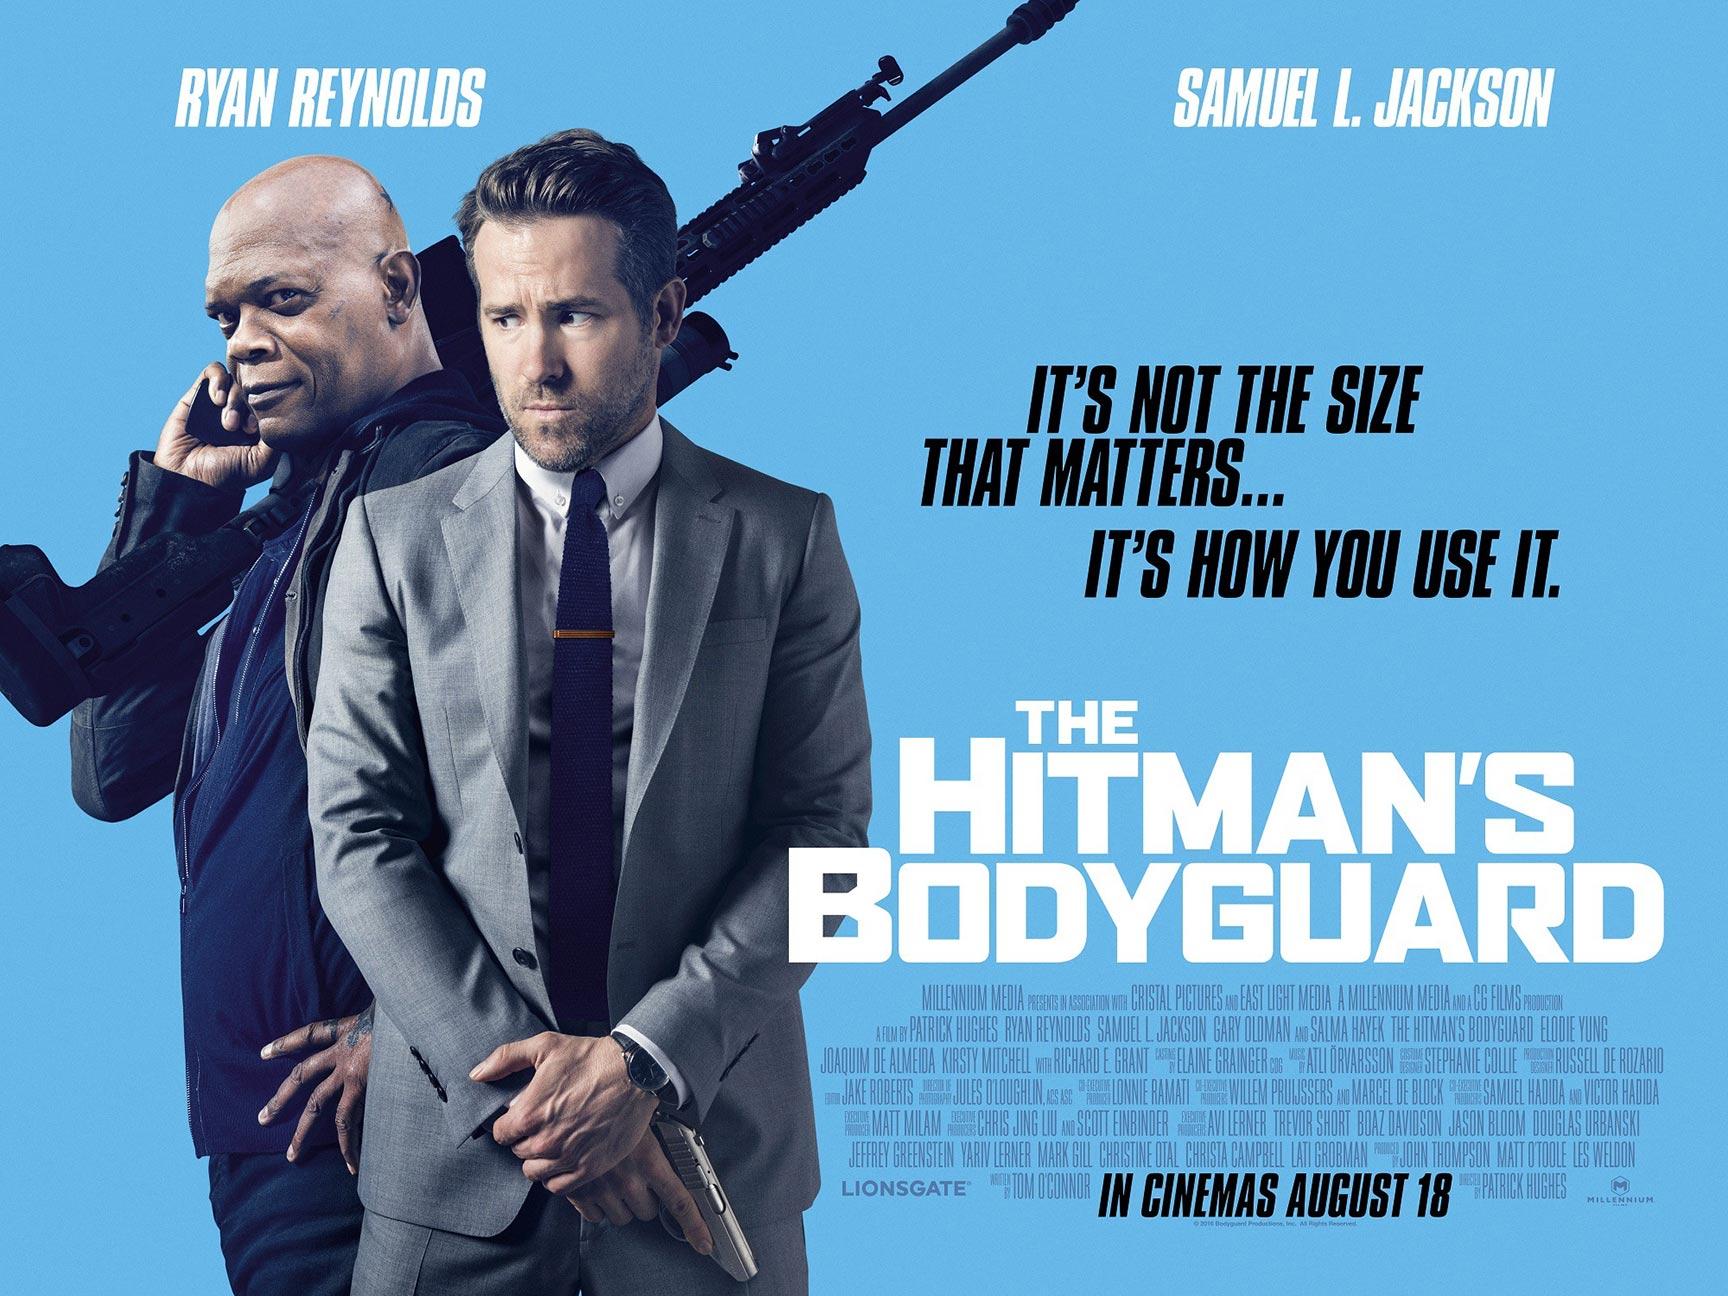 http://cdn.traileraddict.com/content/lionsgate/hitmans-bodyguard-poster-4.jpg